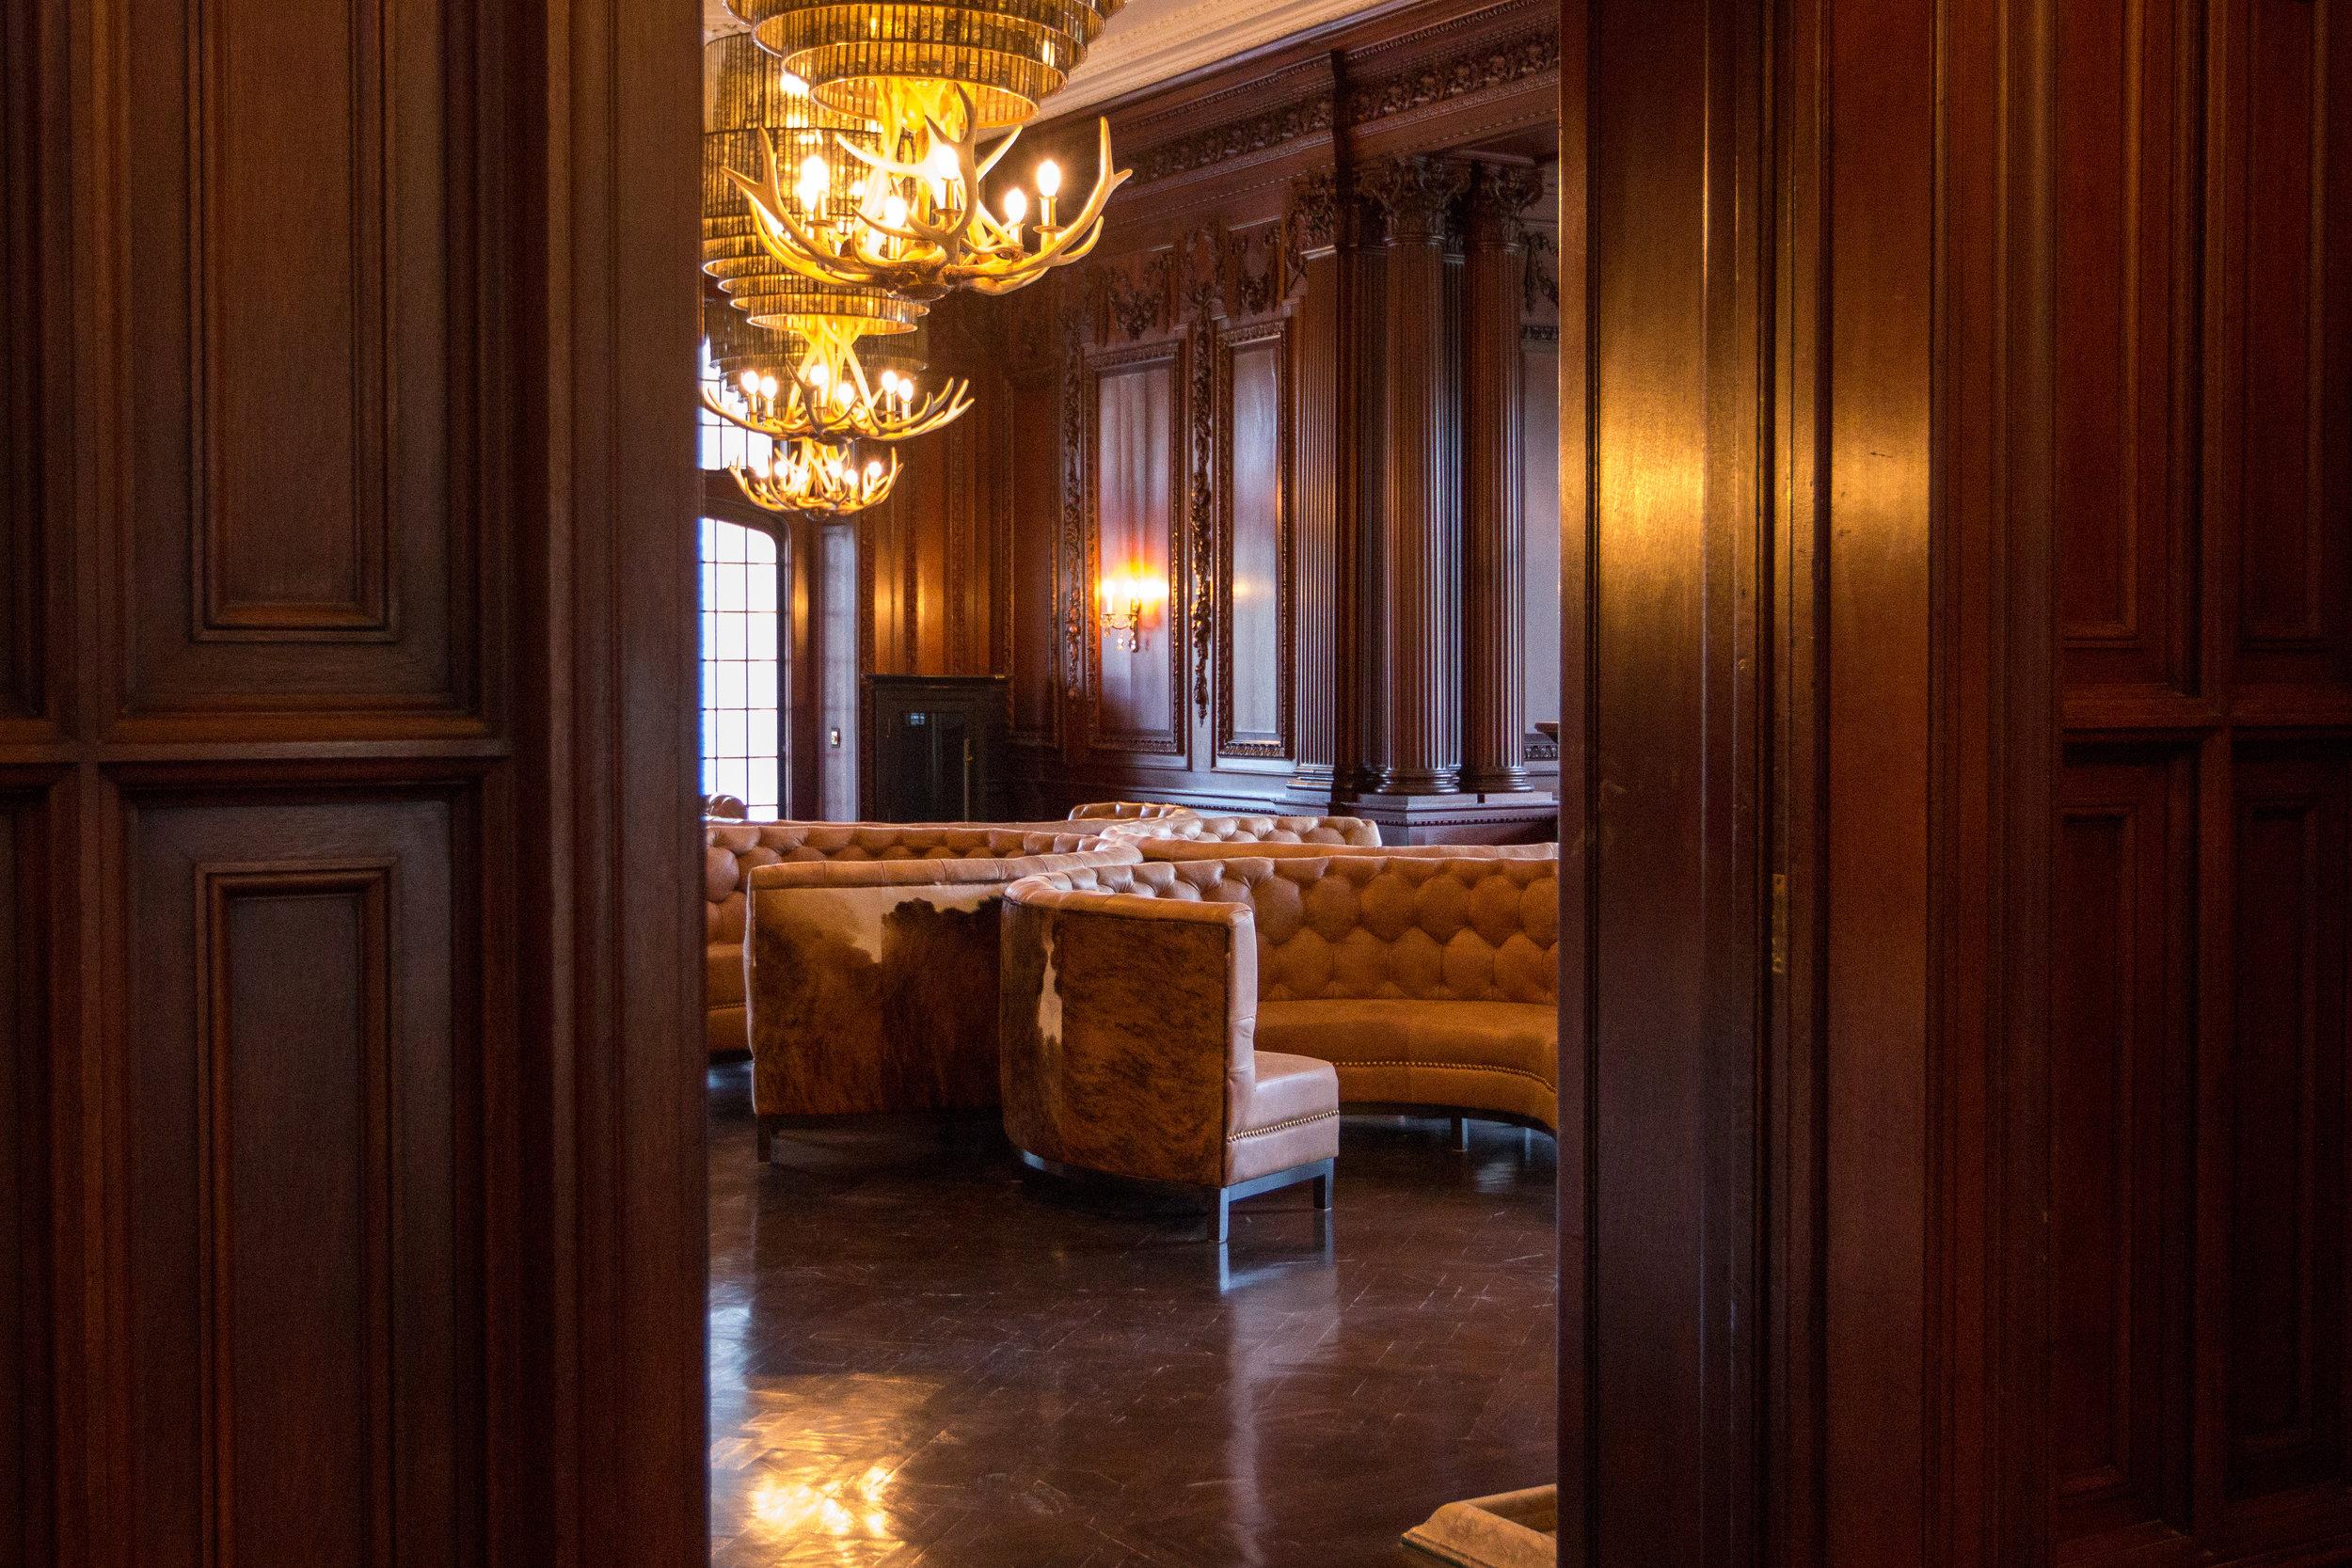 The swanky room